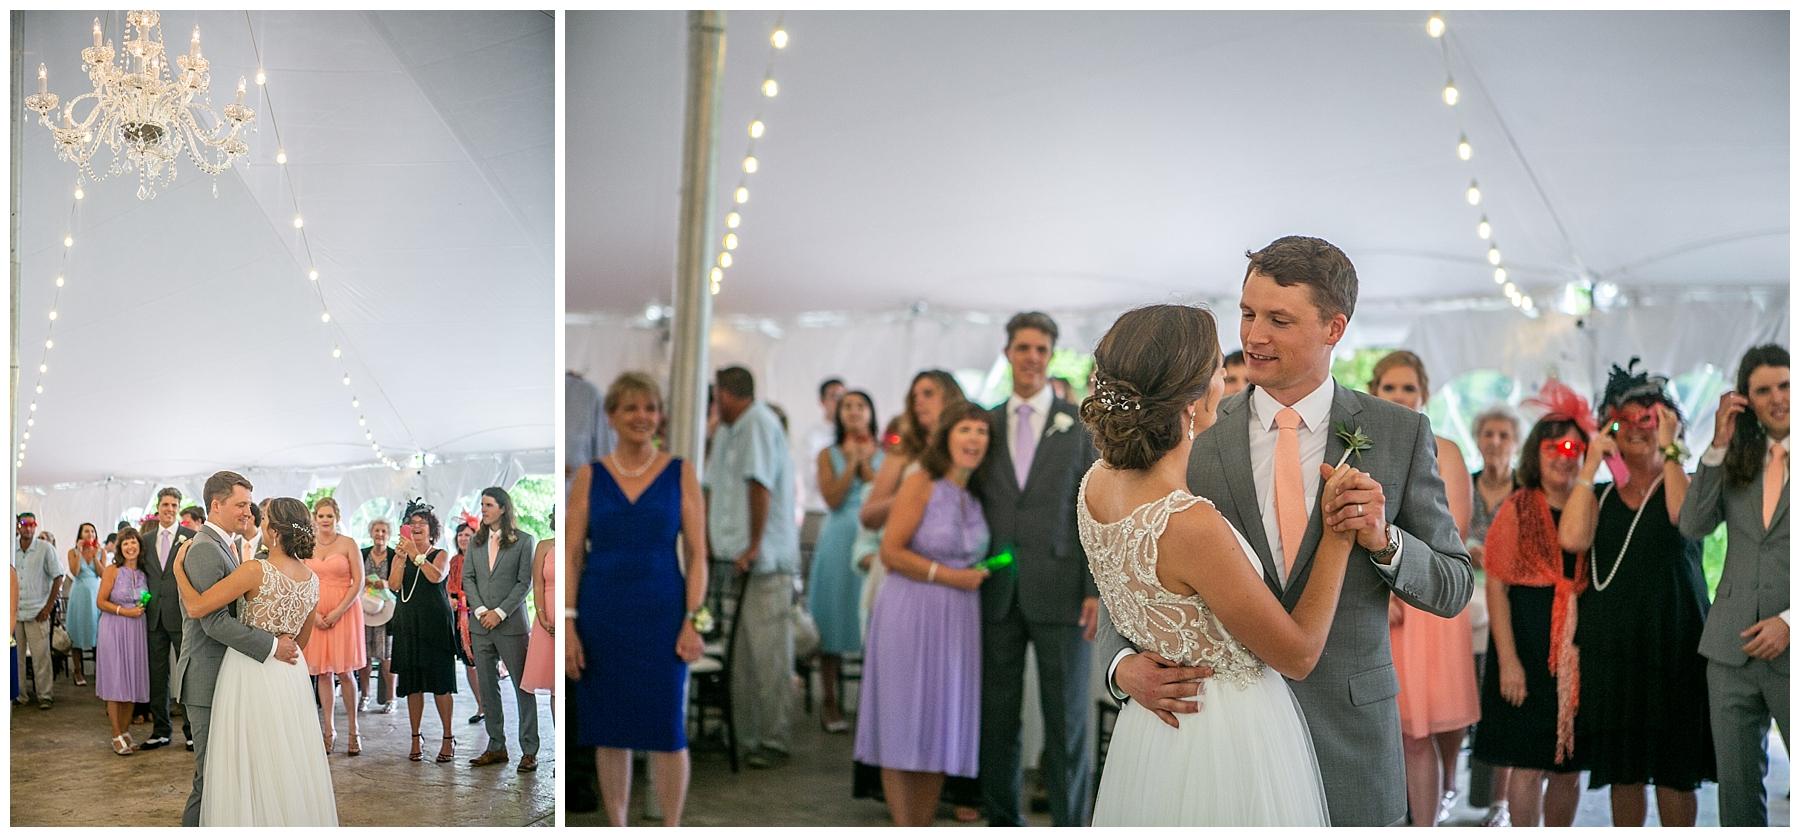 Chelsea Phil Bohemia River Overlook Wedding Living Radiant Photography photos_0132.jpg